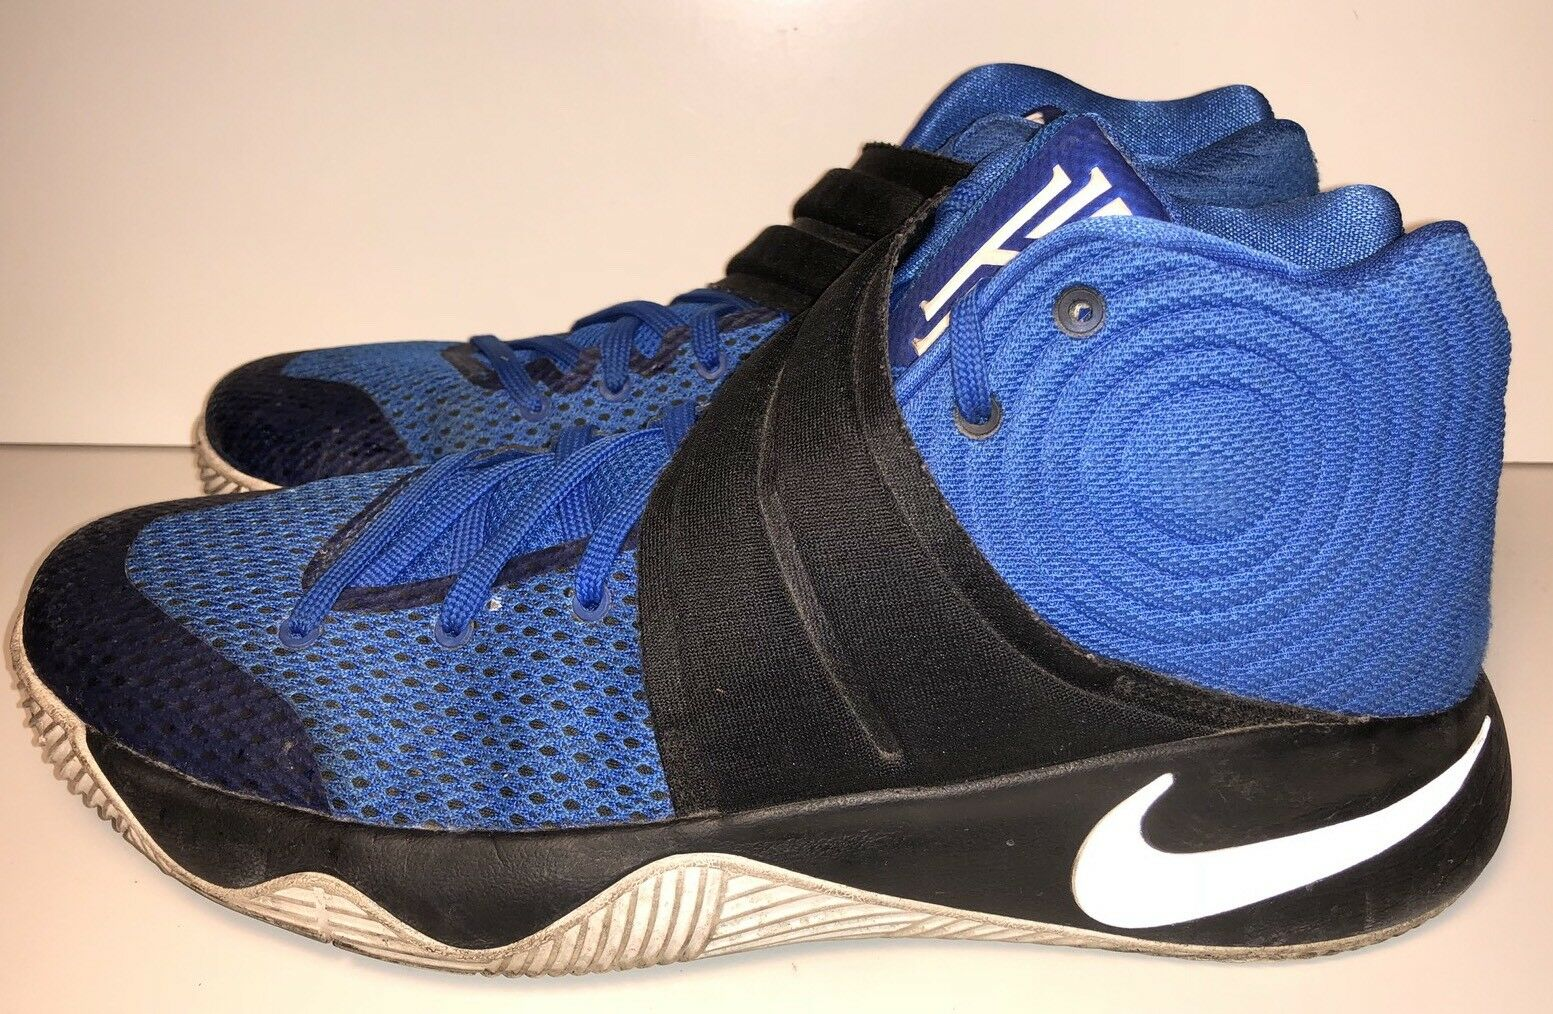 Nike 819583-444 Kyrie 2 Brotherhood Size 11.5 Hyper Cobalt/White-Black 819583-444 Nike 90e302